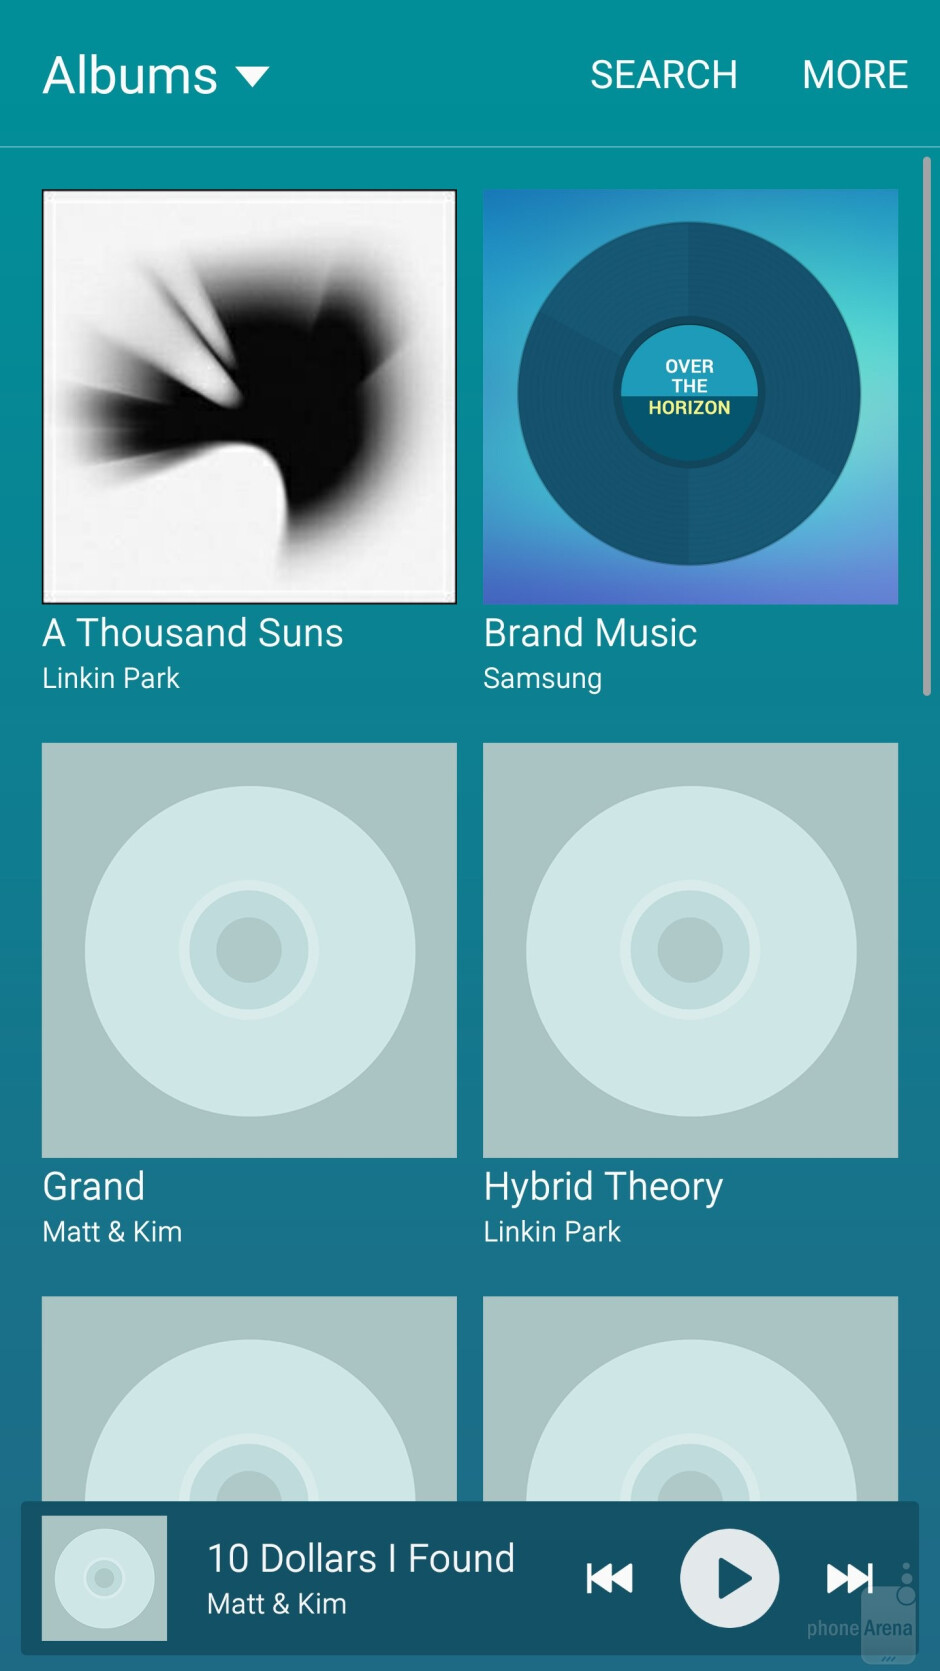 Samsung Galaxy S6 edge - Music players - Samsung Galaxy S6 edge vs HTC One M9